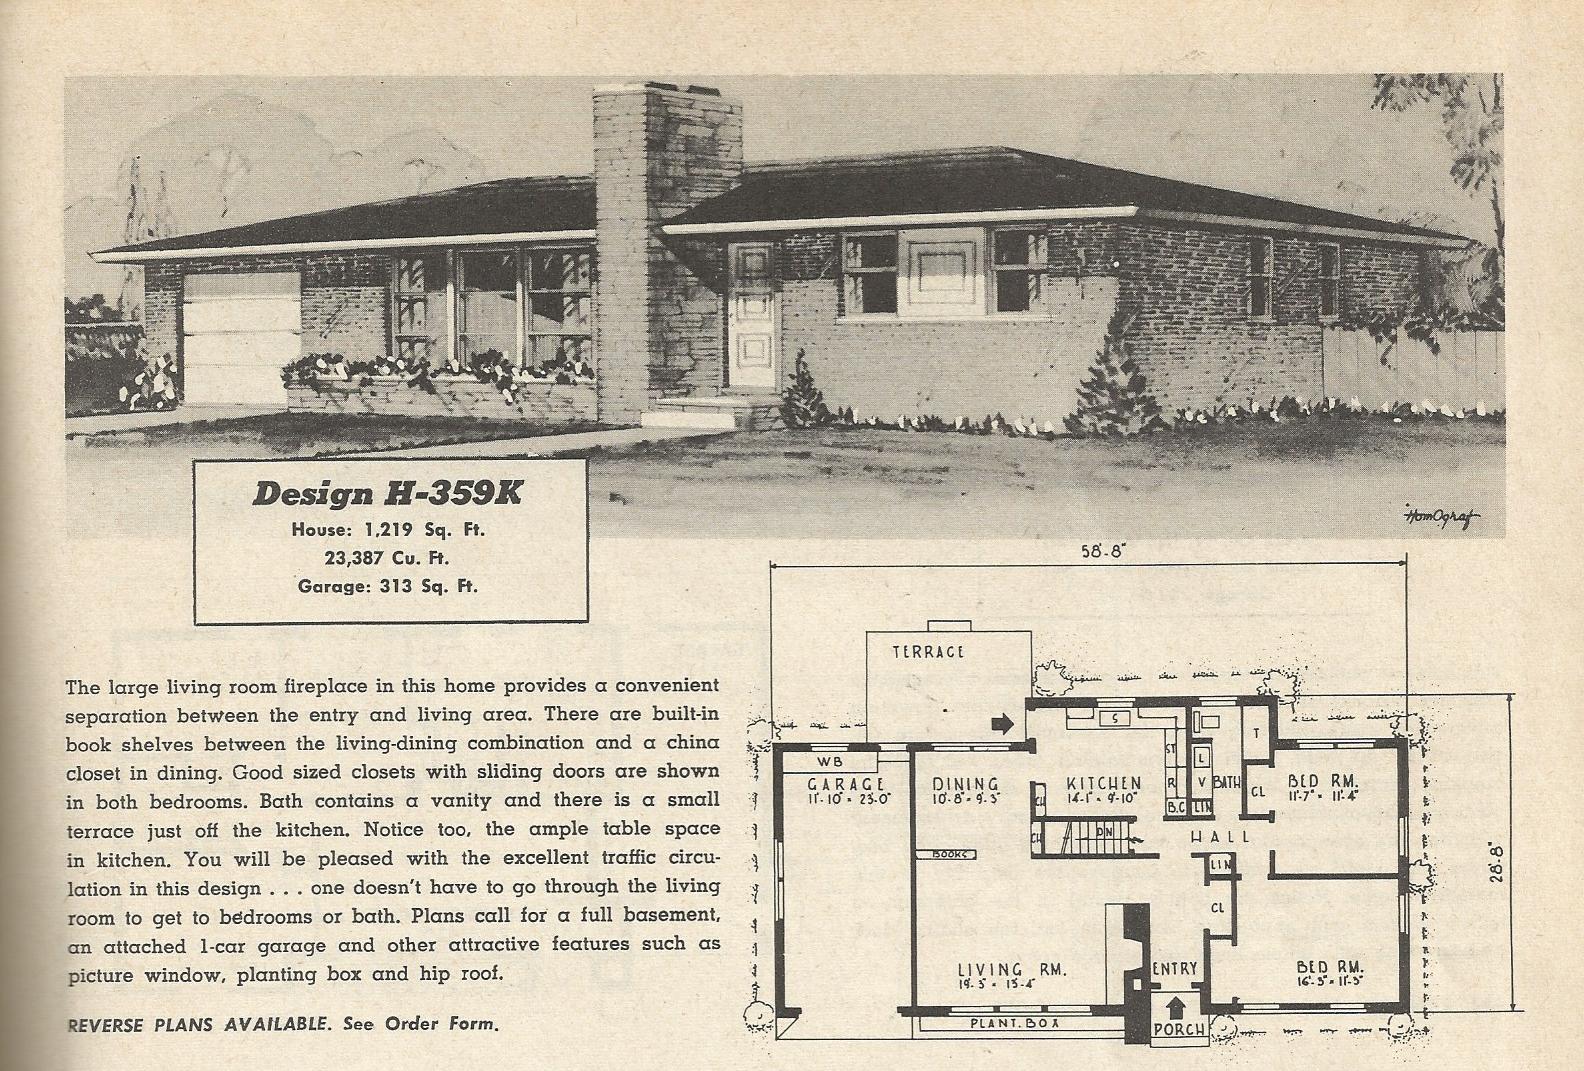 Vintage house plans 359 antique alter ego for Antique house plans